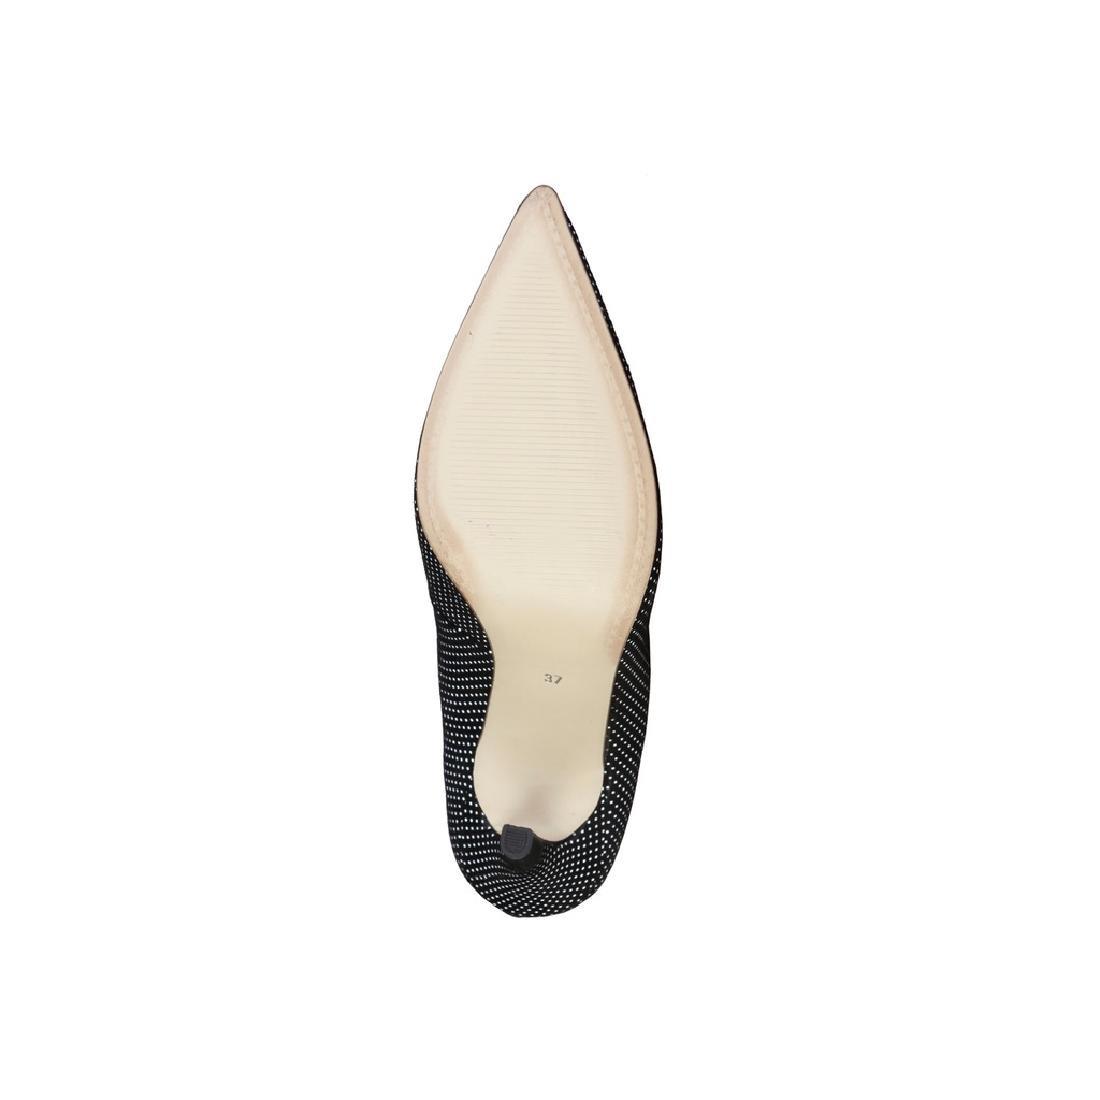 New Women's Pierre Cardin High Heel Pumps Shoes US 8.5 - 6